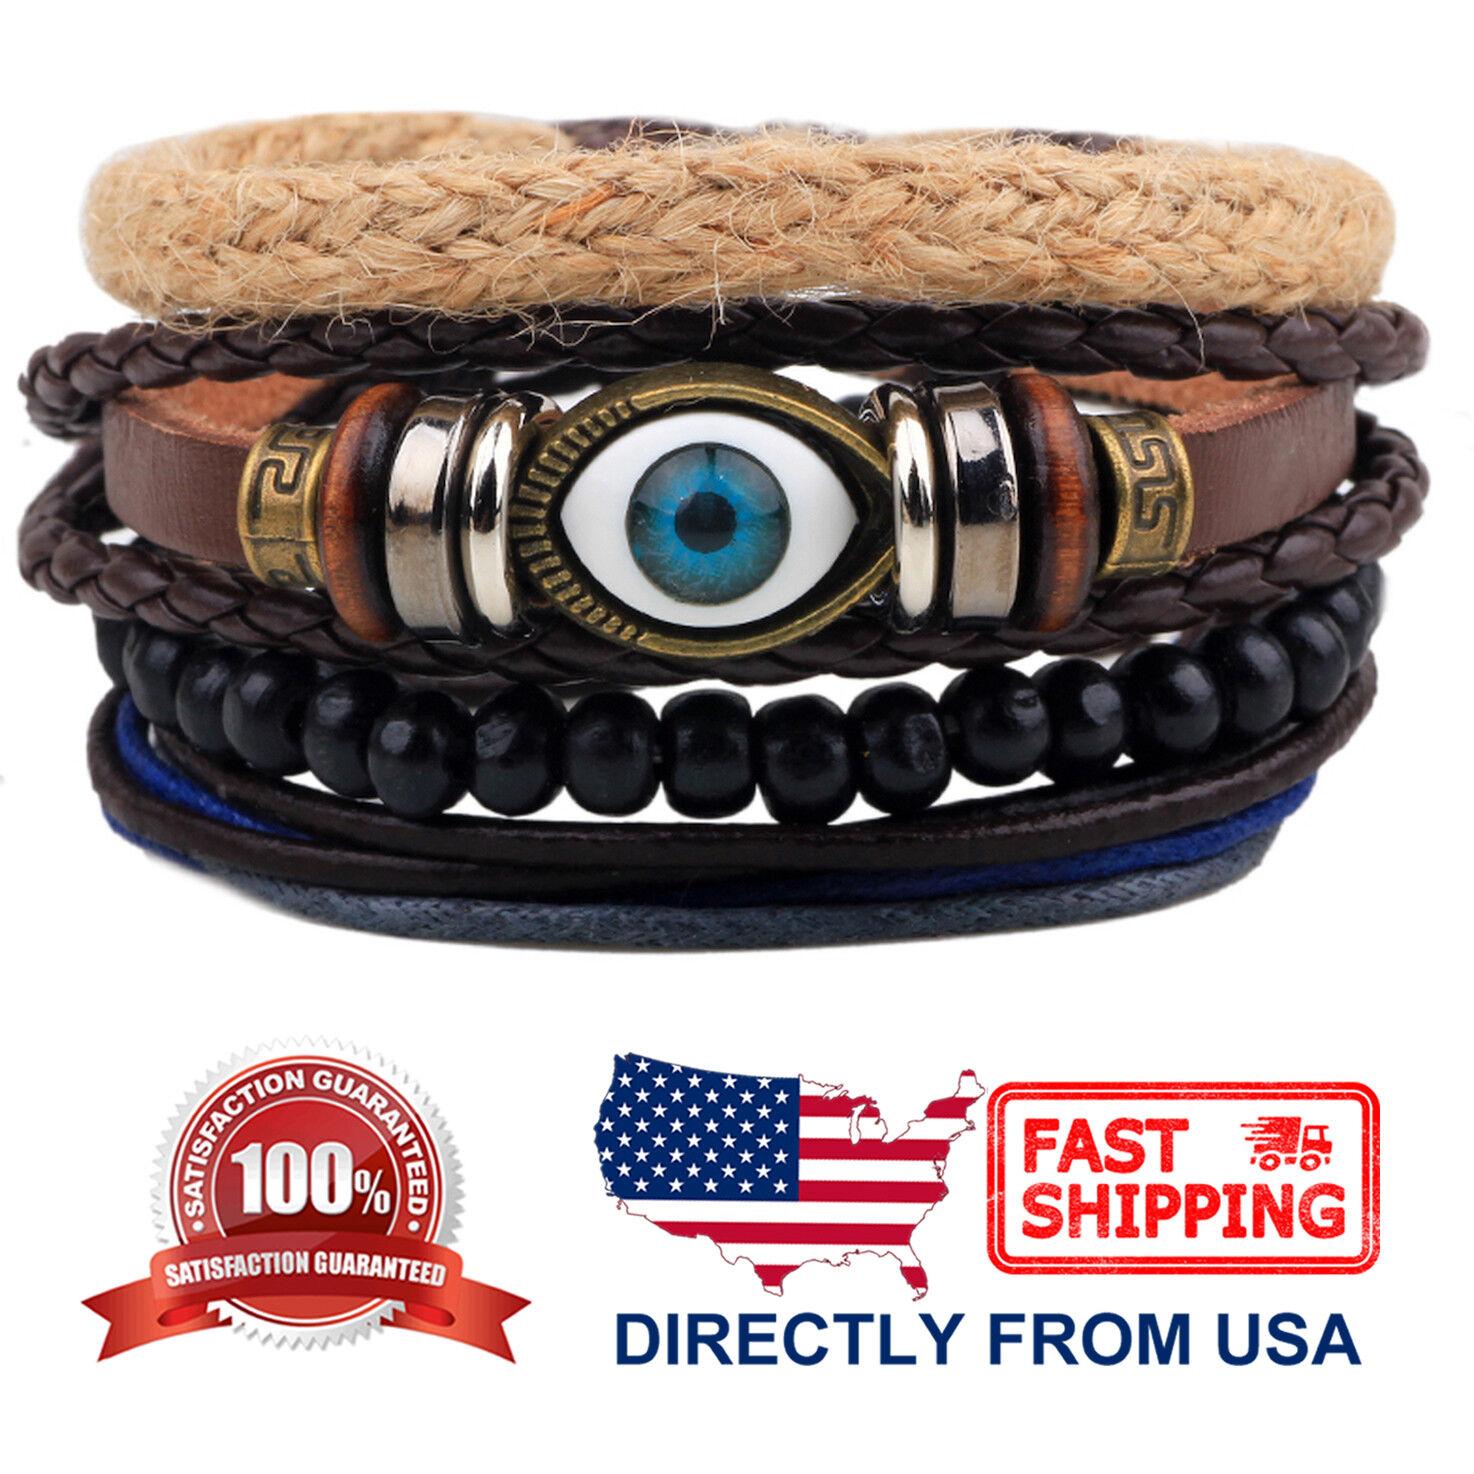 Evil Eye and Tribal Wood Beads Leather Men Women Wristband Bracelet 4pcs Set Bracelets